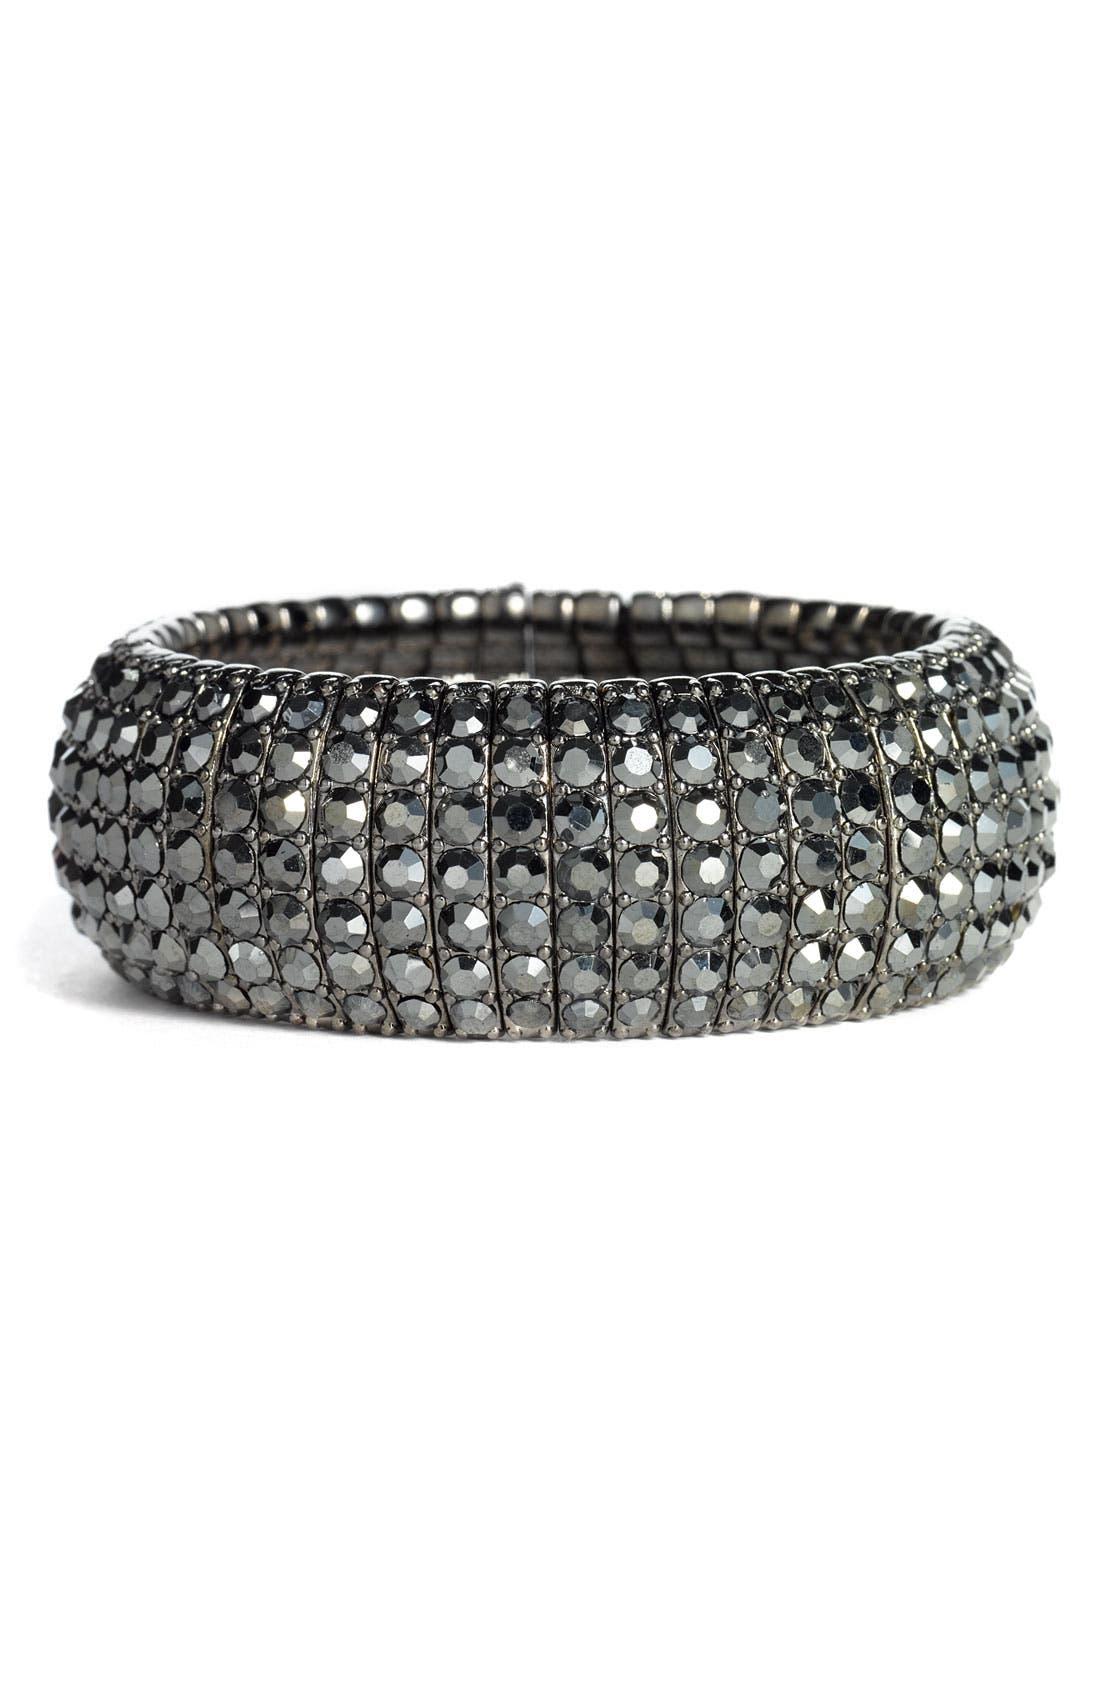 Crystal Stretch Bracelet,                             Main thumbnail 1, color,                             002